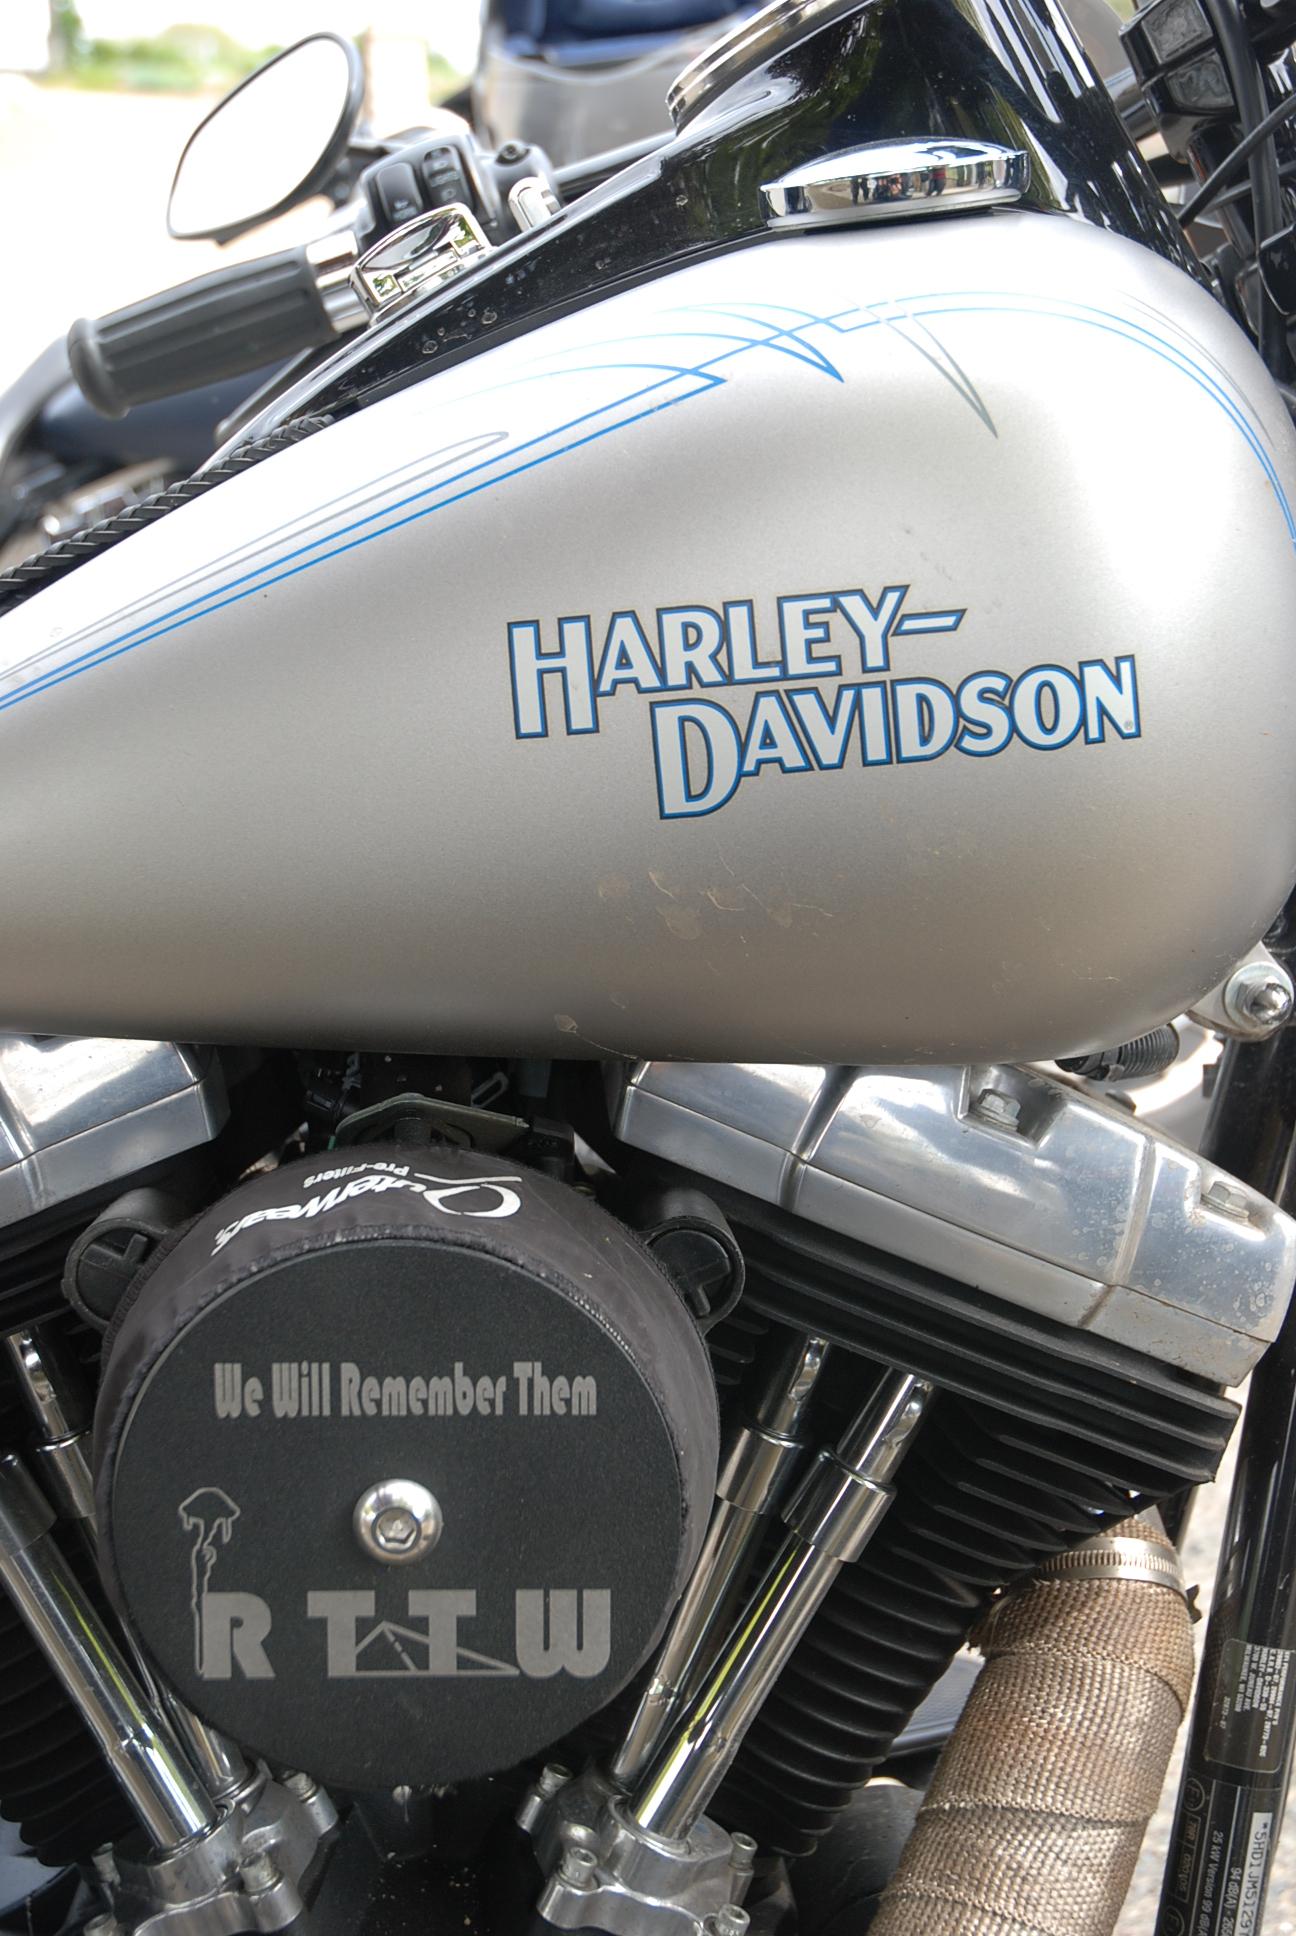 4a my friend Steve Harris' bike